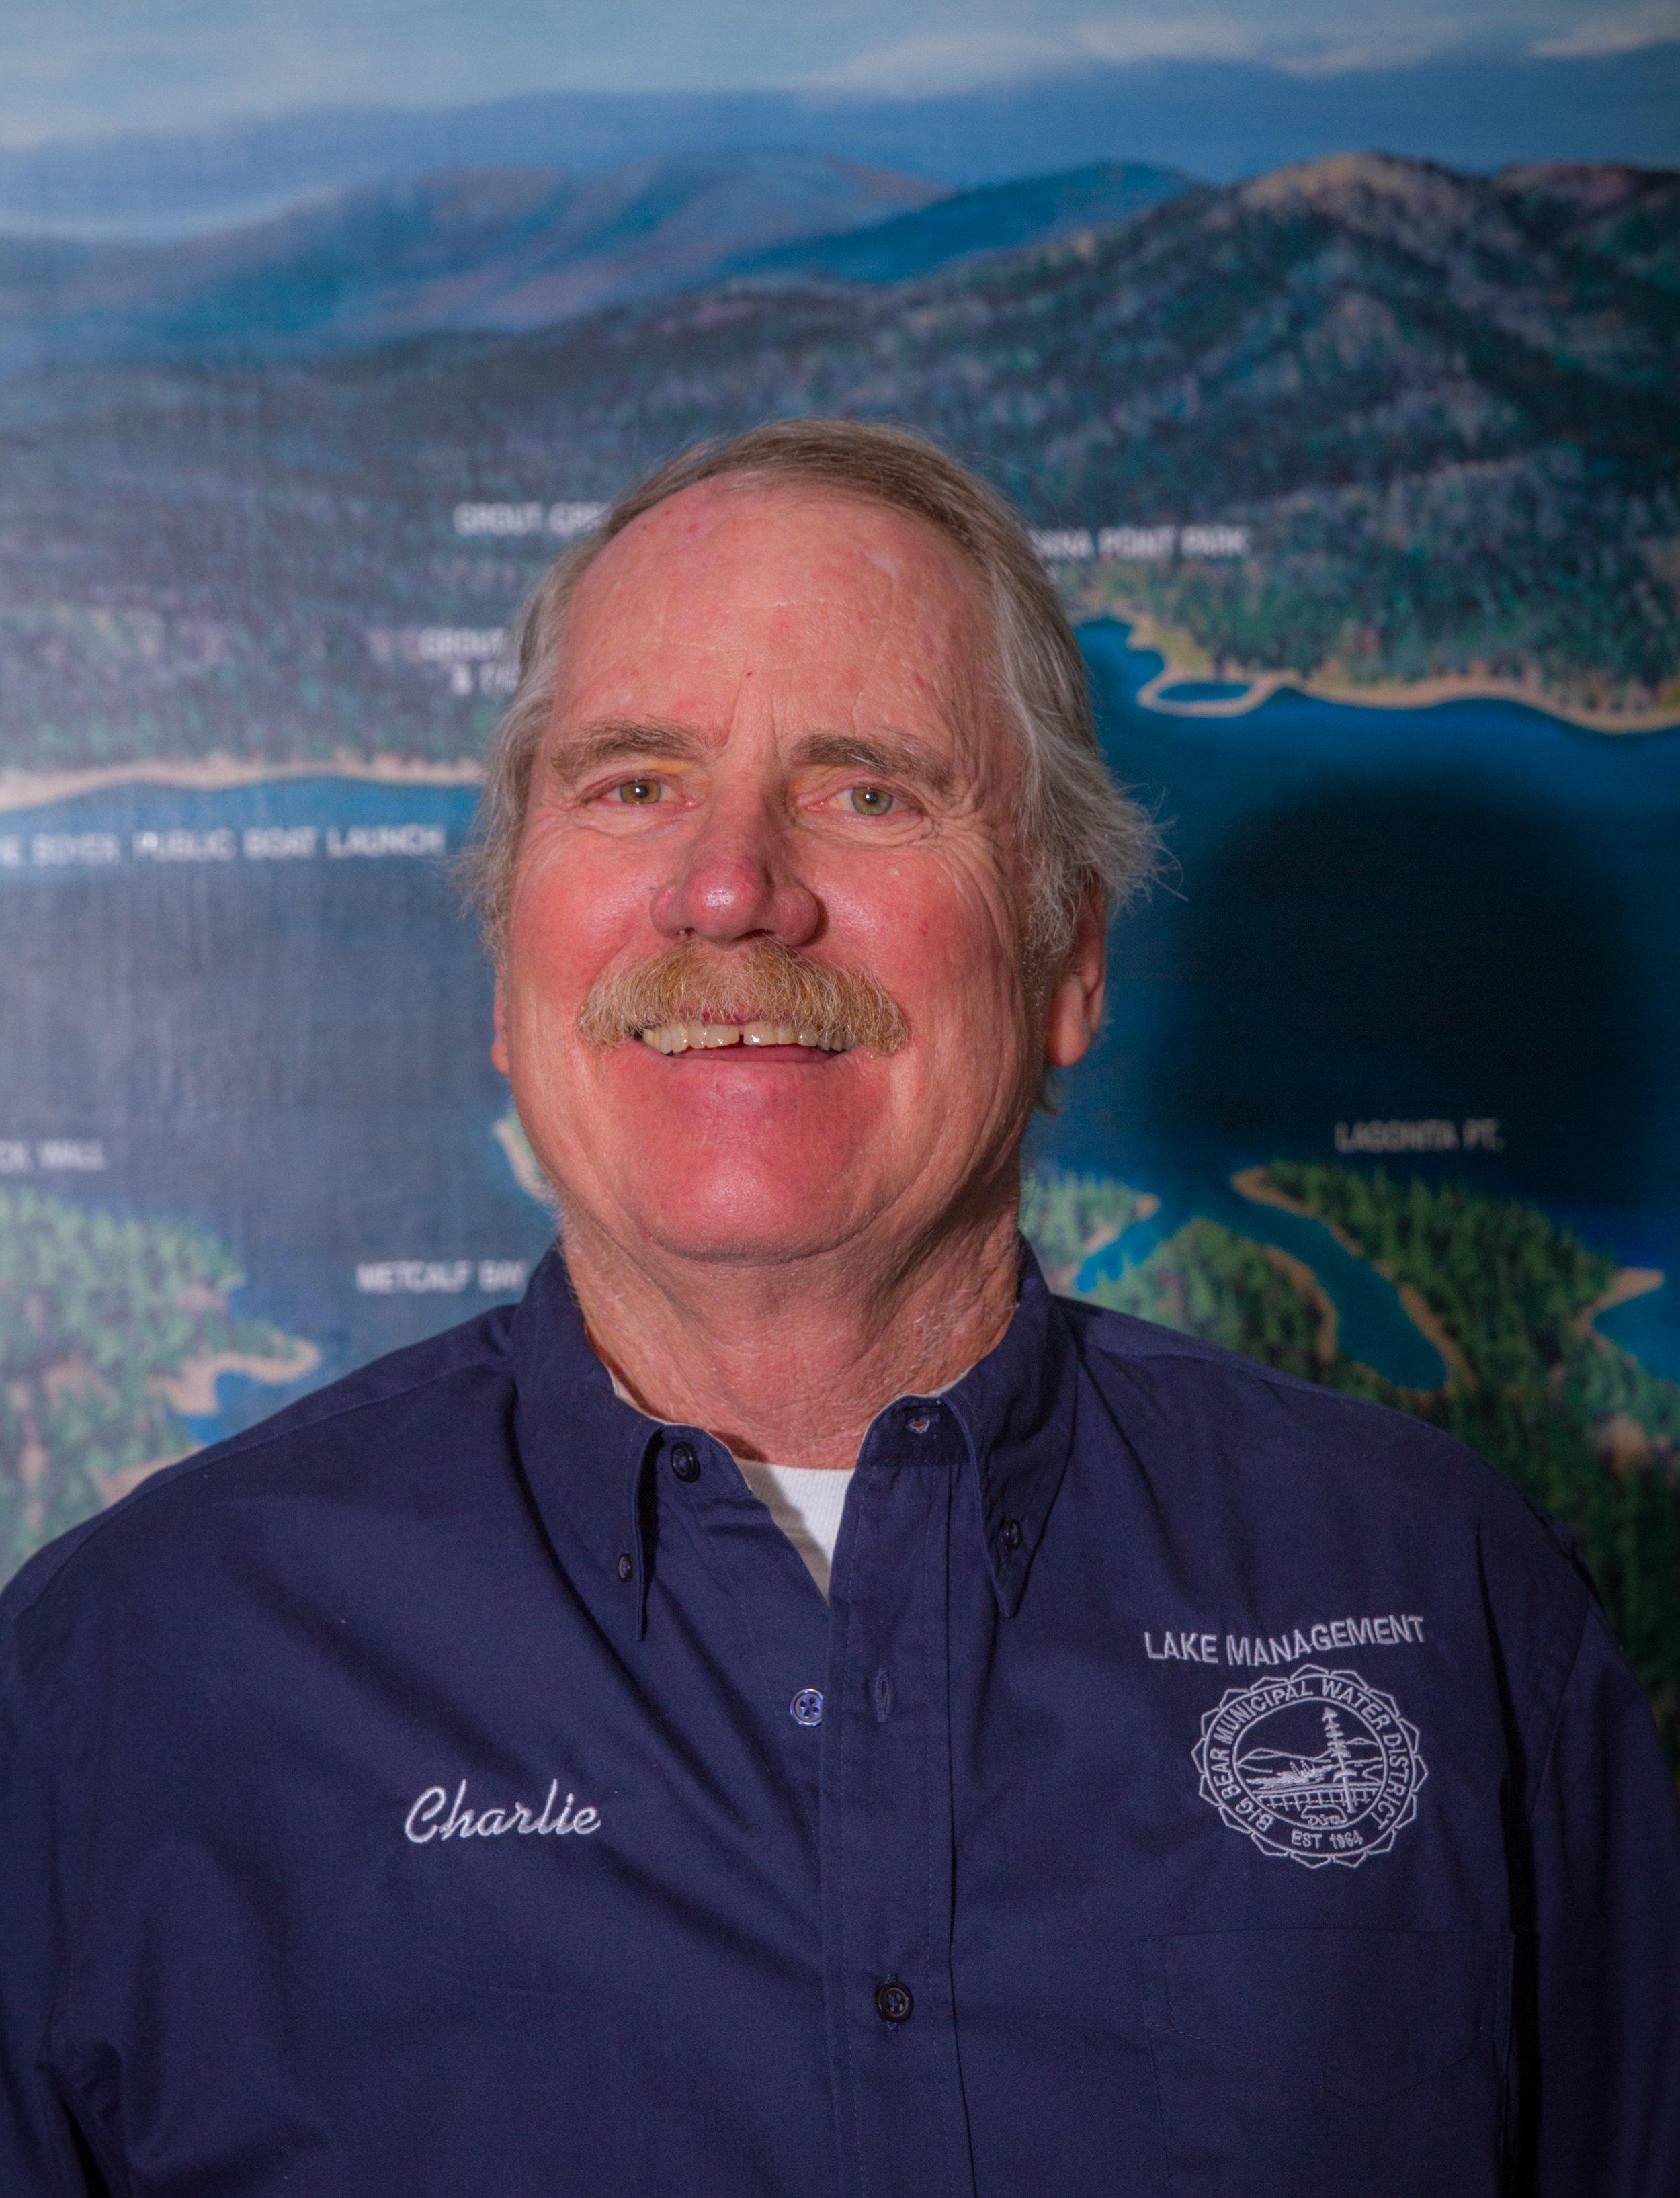 Charlie Brewster: Vice President - Division 3